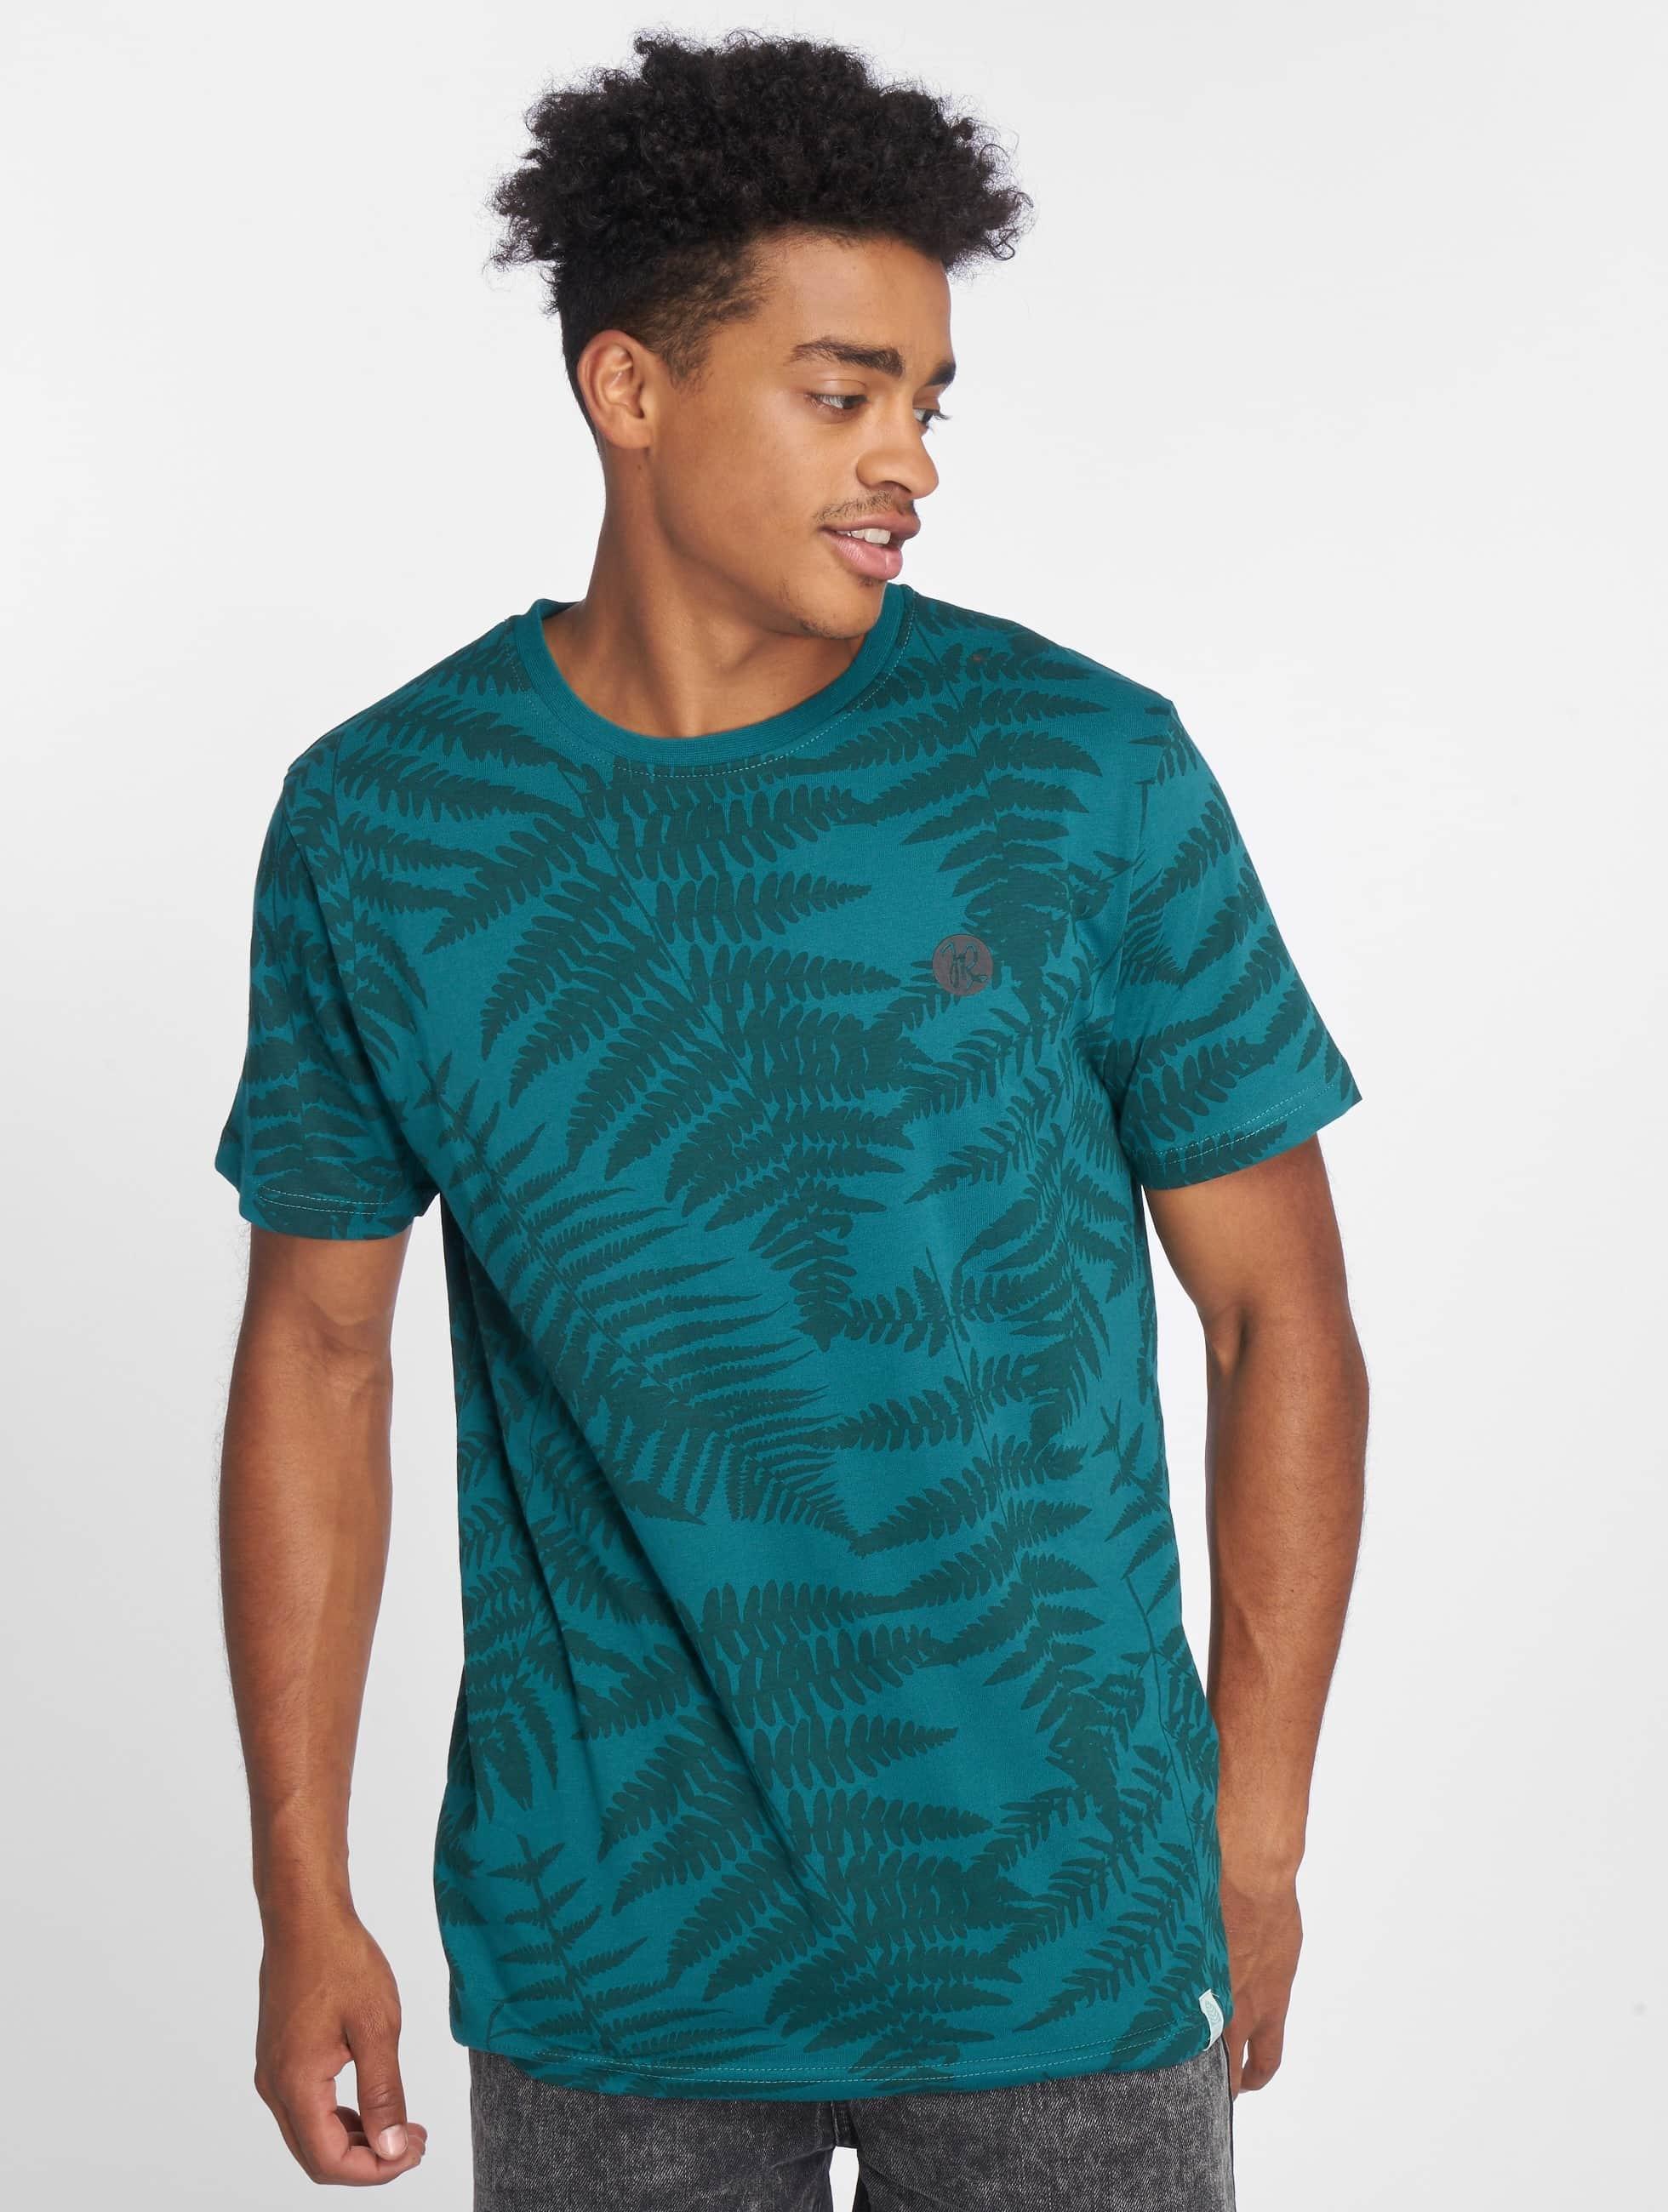 Just Rhyse / T-Shirt Zorritos in green 2XL